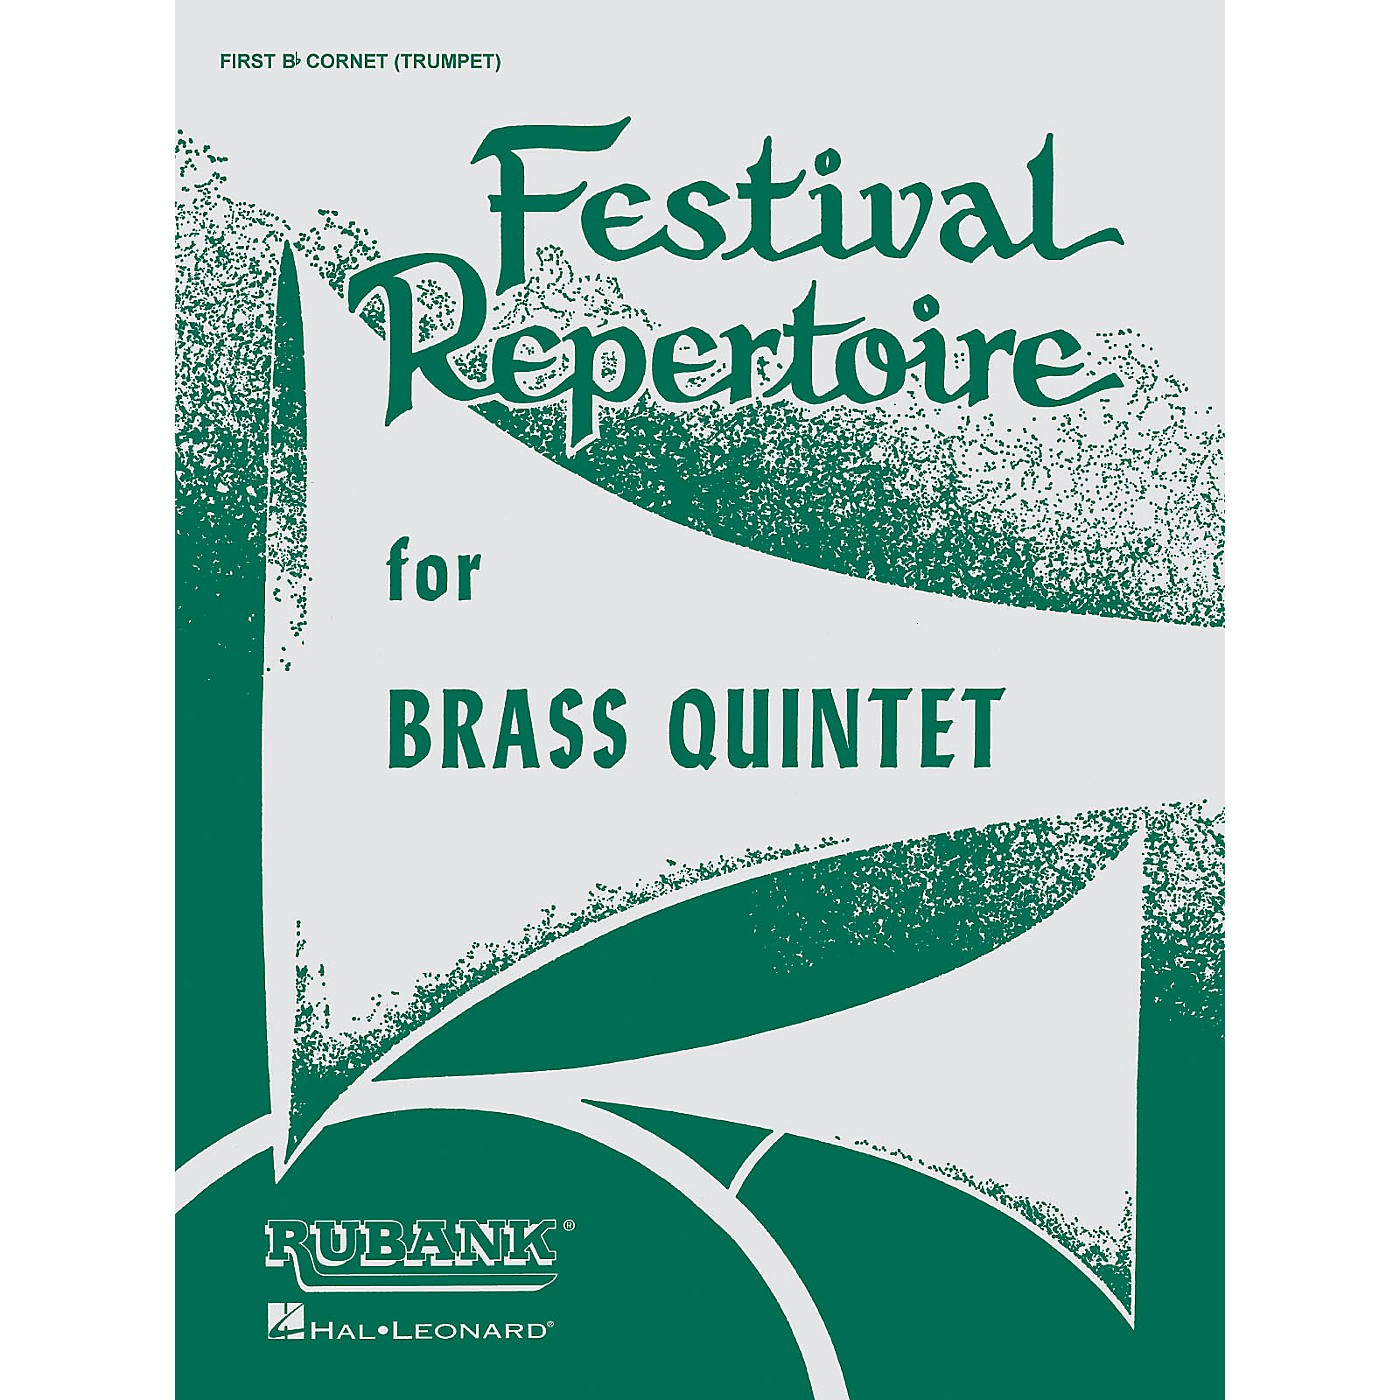 Rubank Publications Festival Repertoire for Brass Quintet (2nd Trombone/Baritone B.C. (4th Part)) Ensemble Collection Series thumbnail